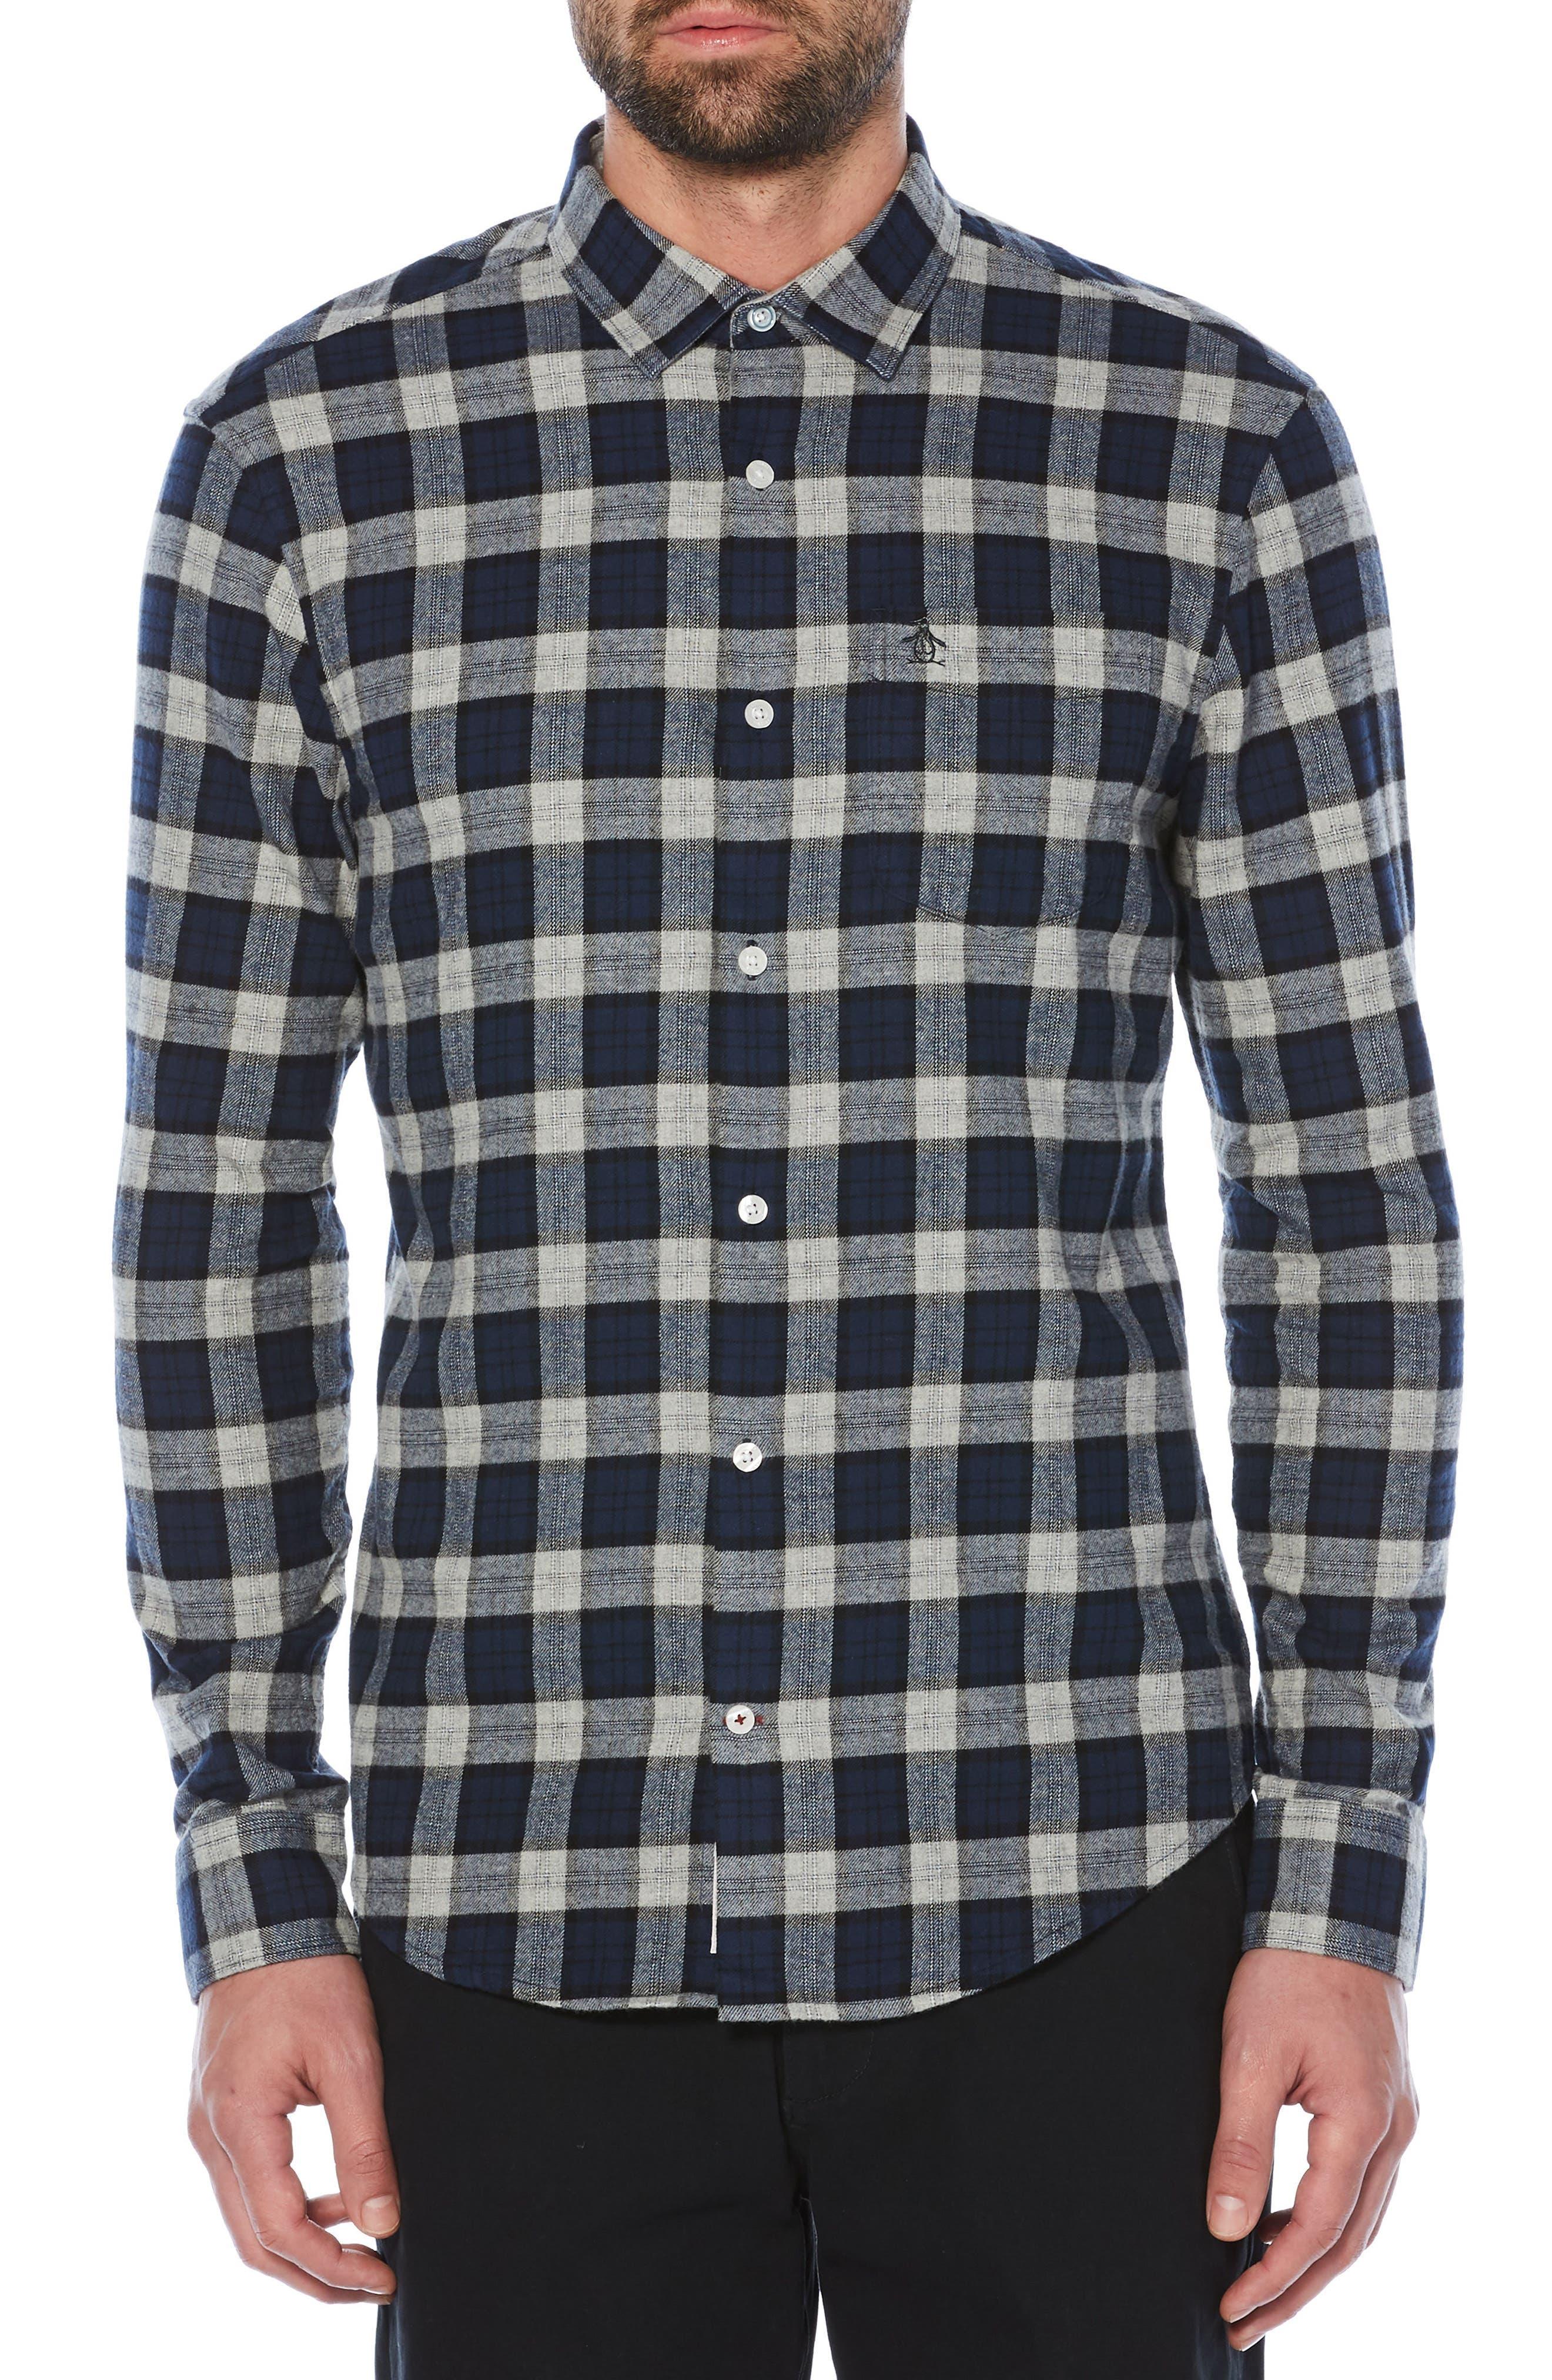 Main Image - Original Penguin Plaid Flannel Shirt